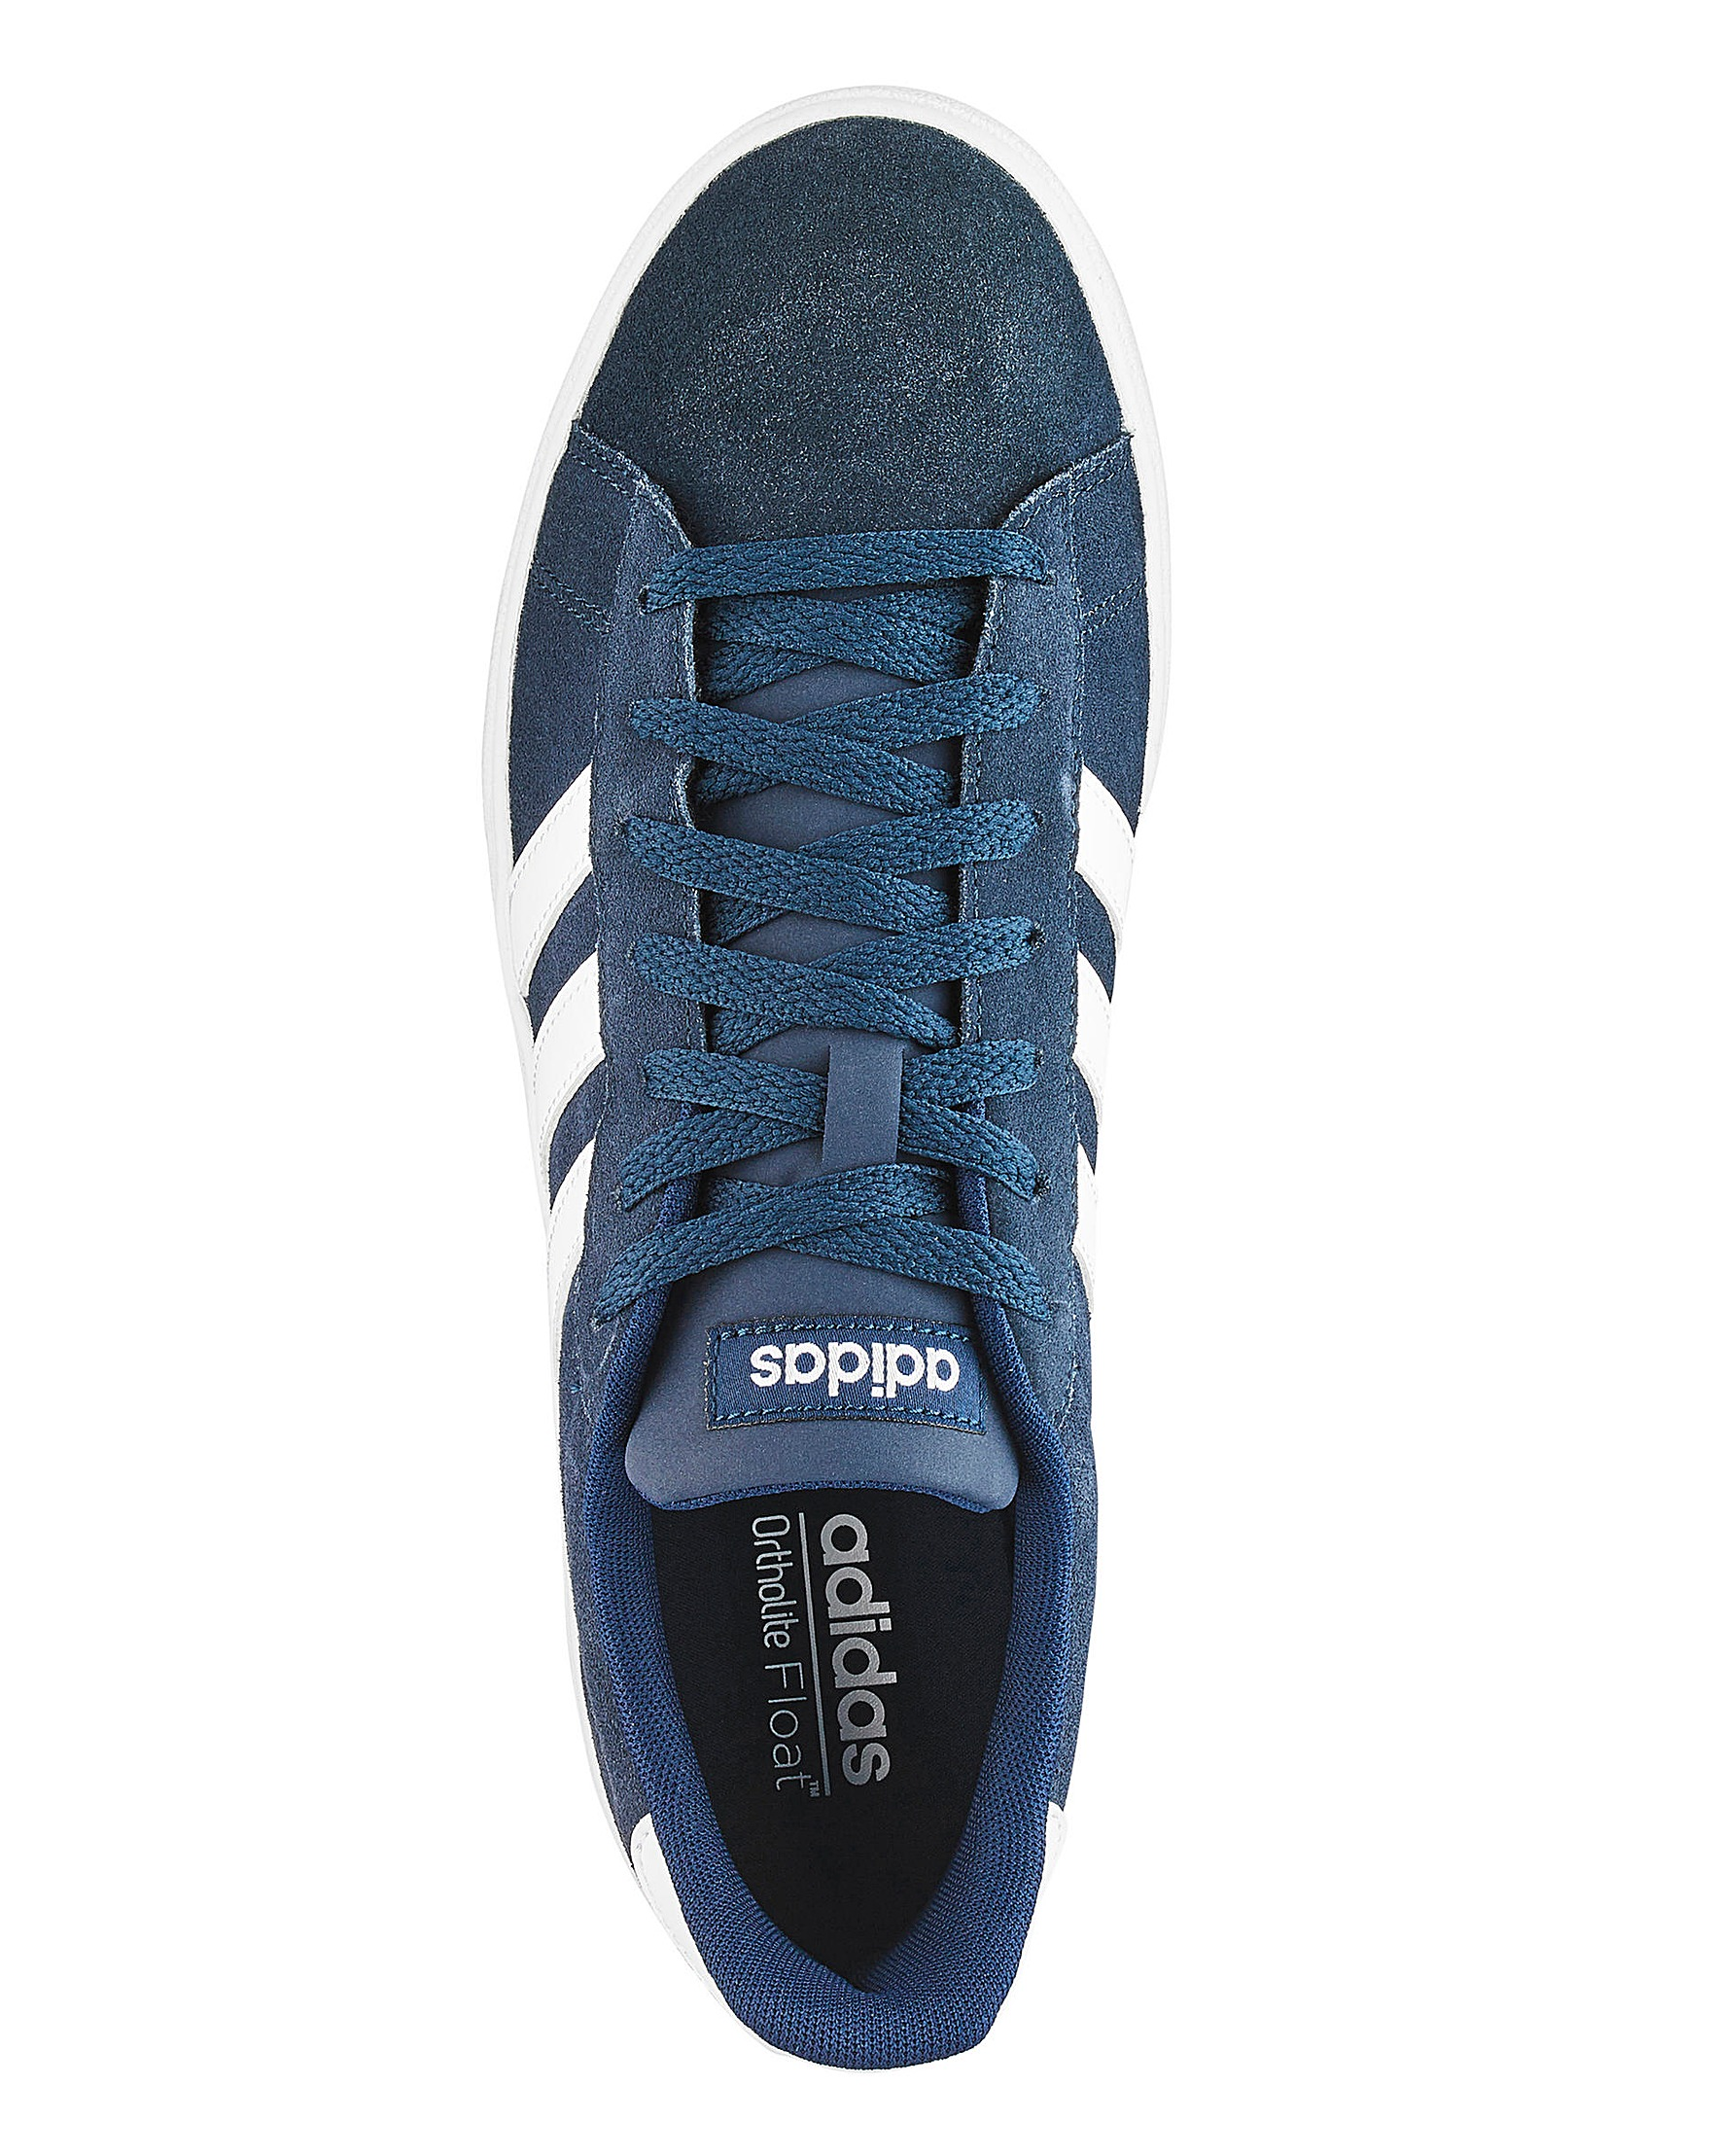 big sale 5af29 2c4de adidas Daily 2.0 Trainers   J D Williams